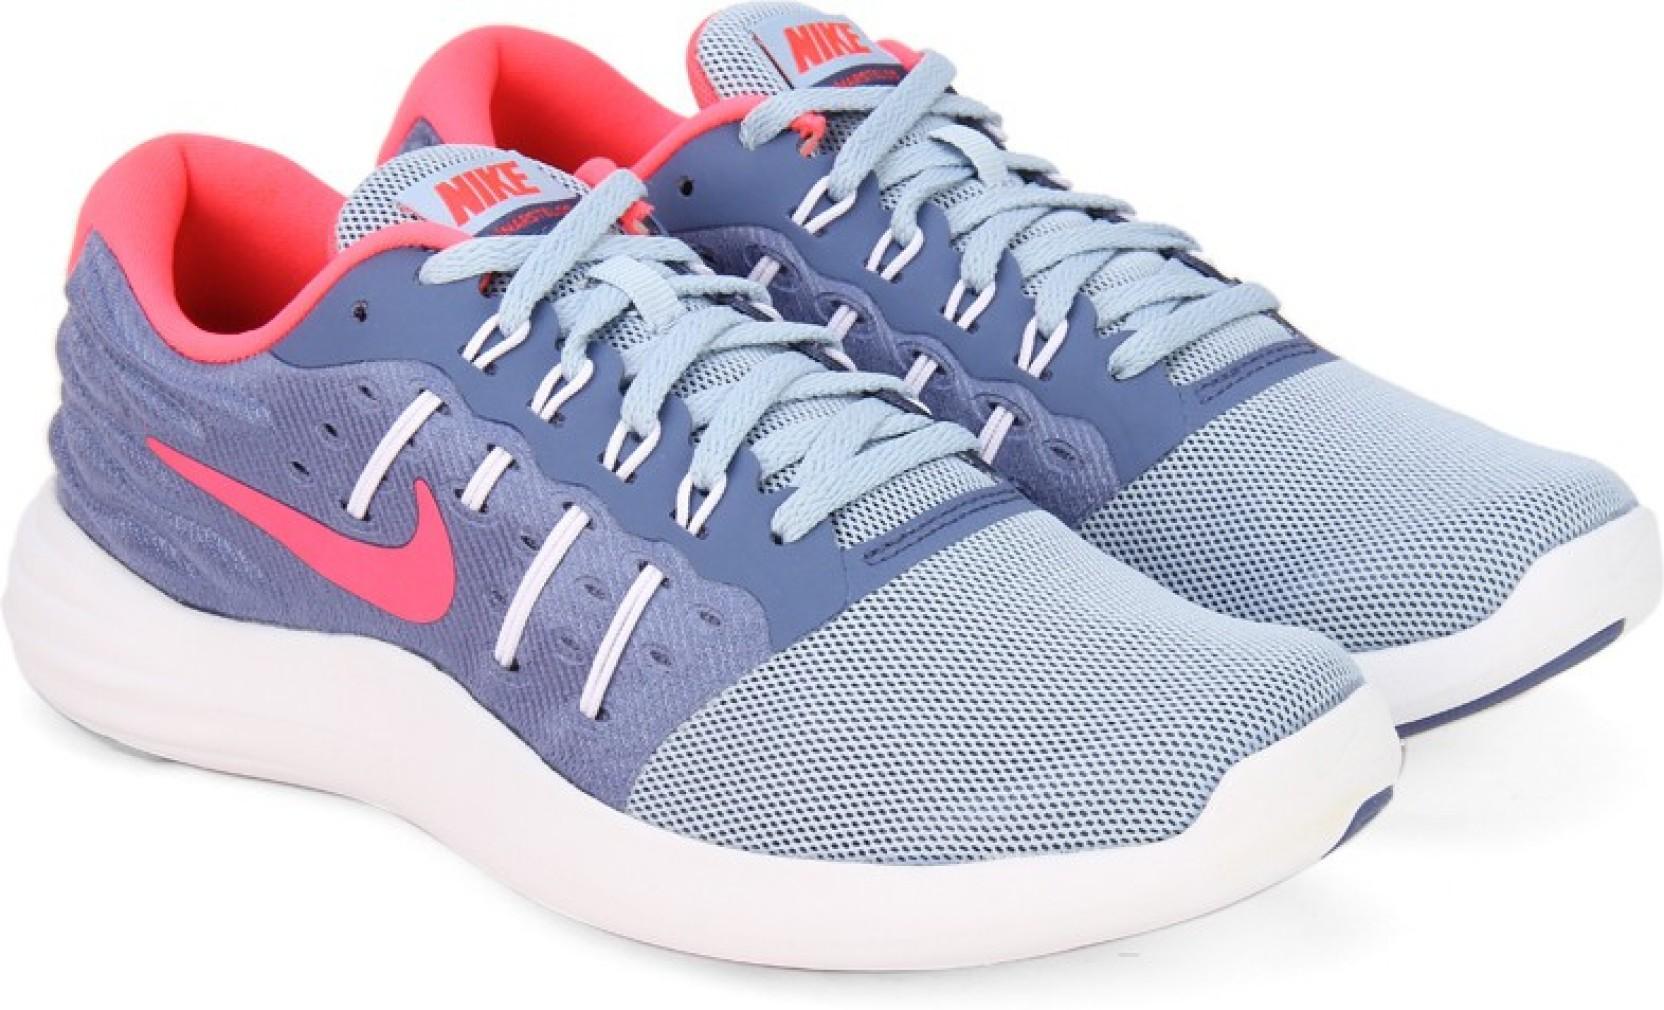 Nike WMNS NIKE LUNARSTELOS Running Shoes For Women - Buy LT ARMORY ... c2761dab5